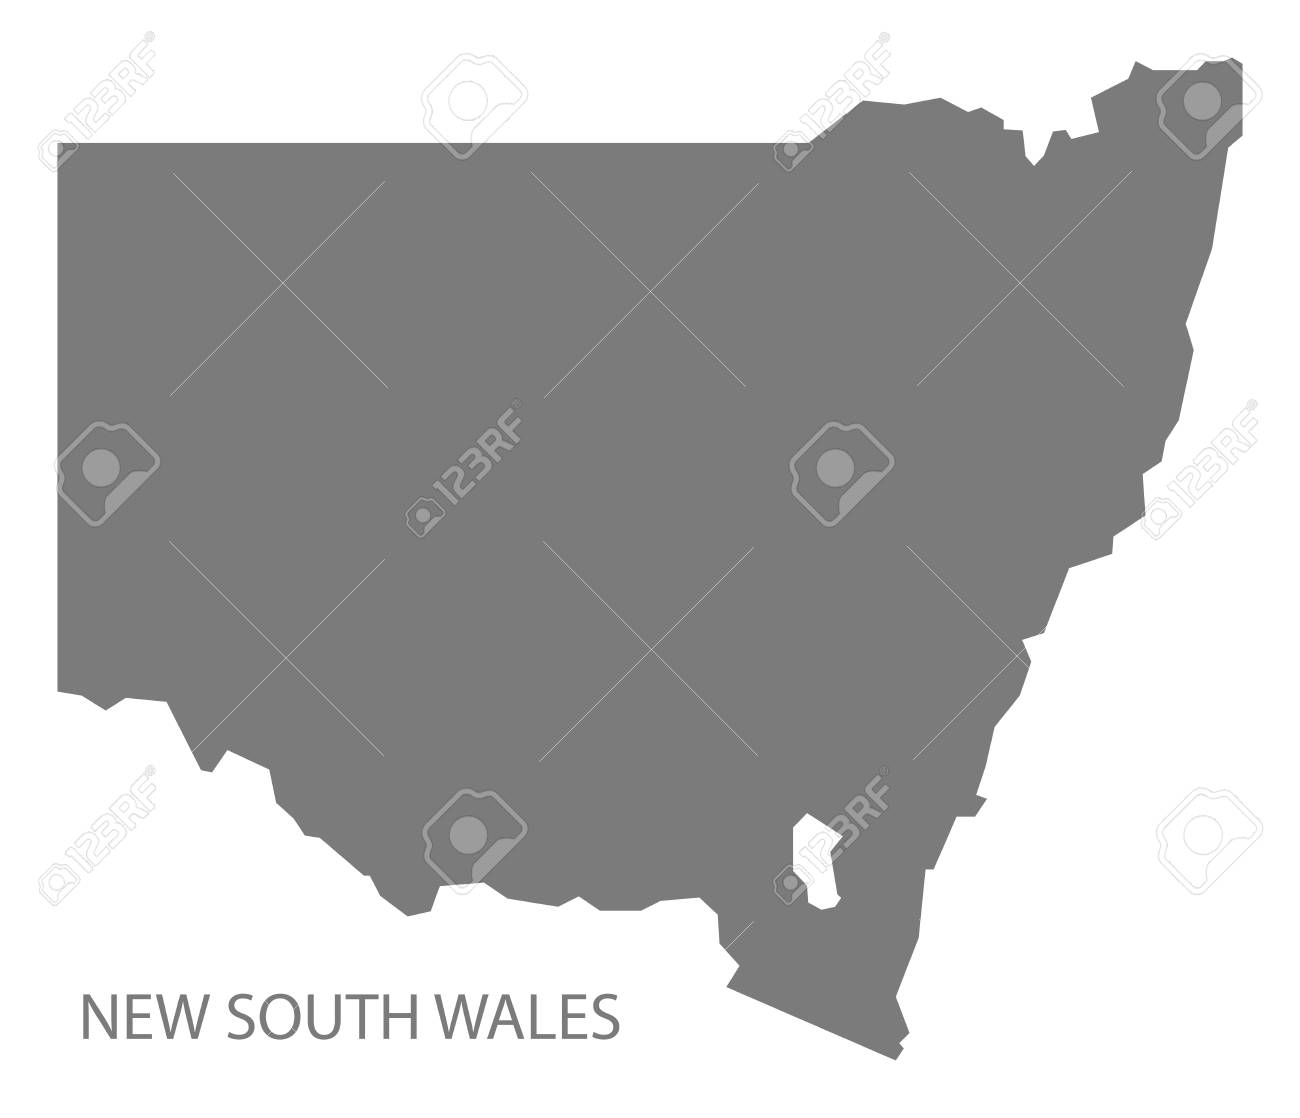 Australia Map Grey.New South Wales Australia Map Grey Royalty Free Cliparts Vectors